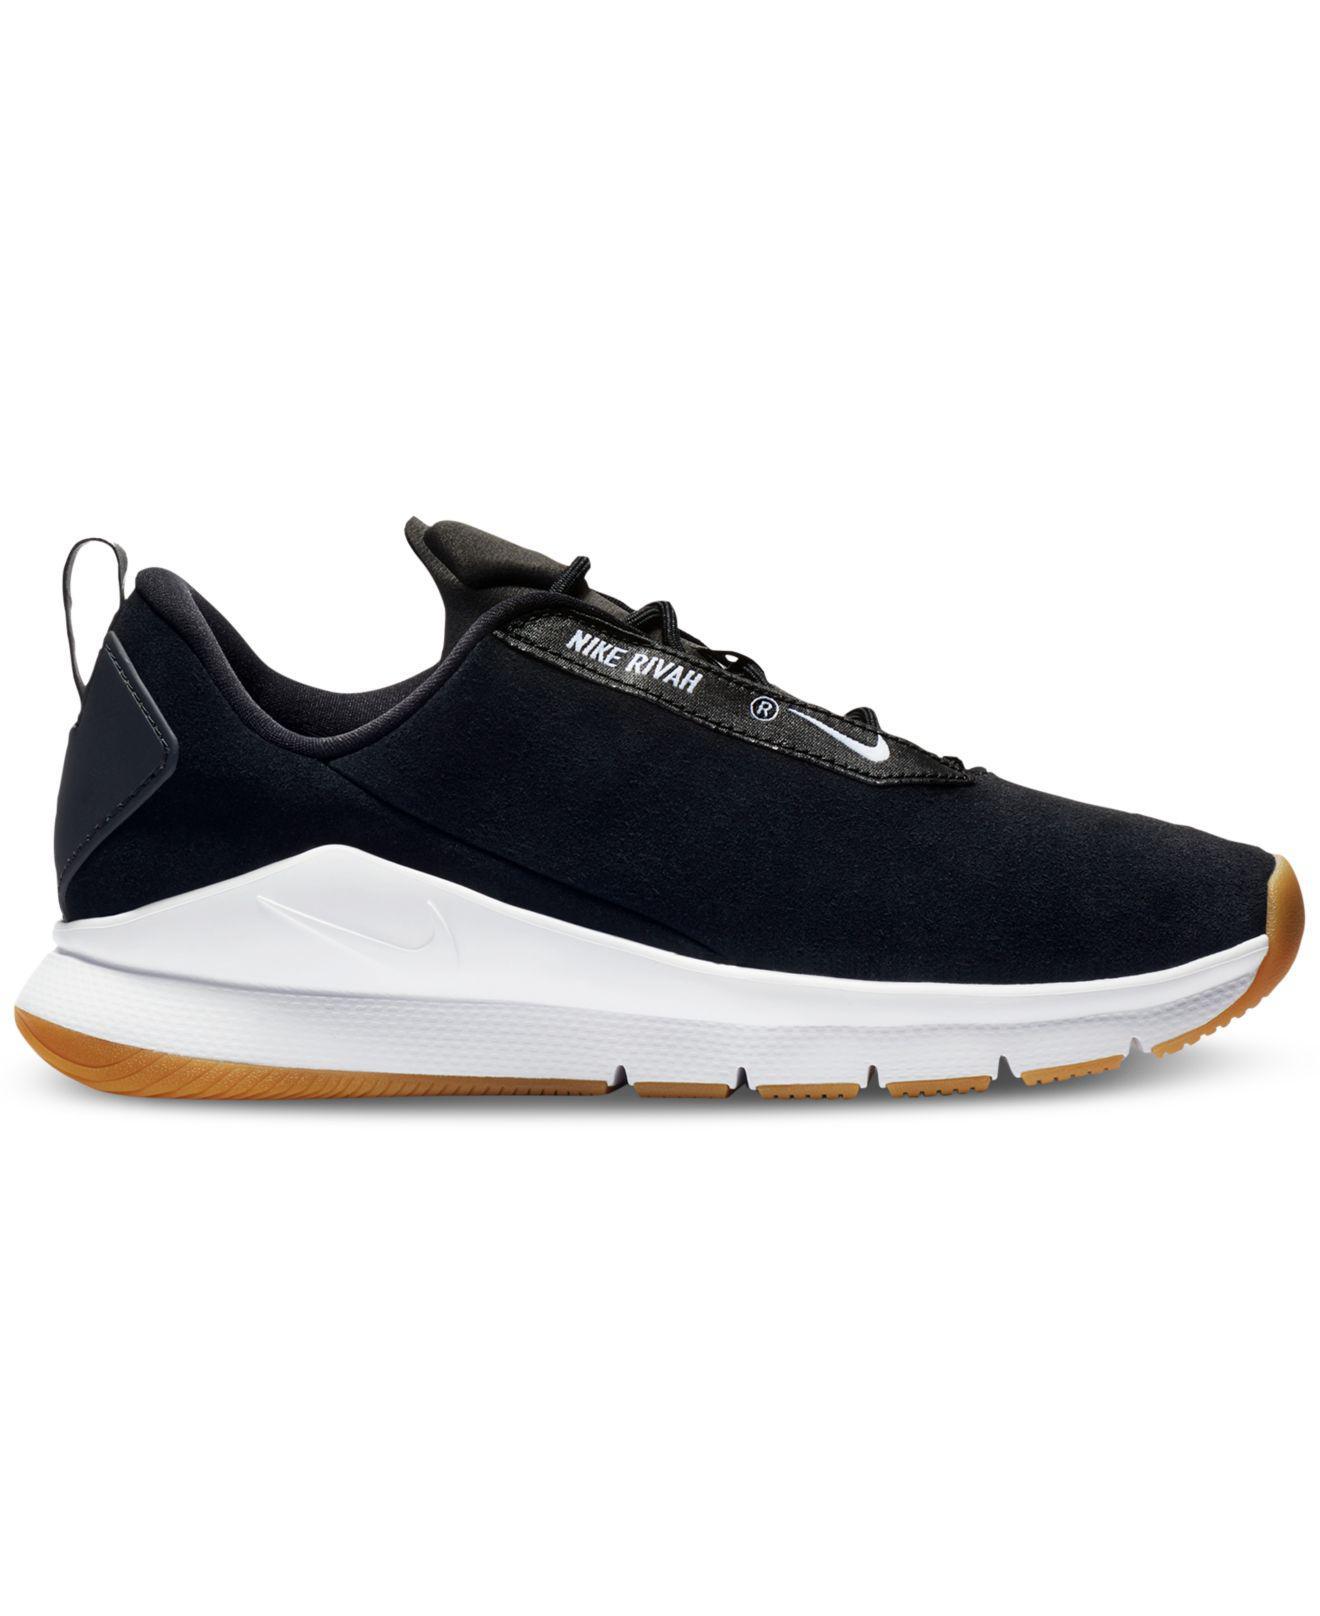 Nike. Men's Black Rivah Premium Casual Sneakers From Finish Line